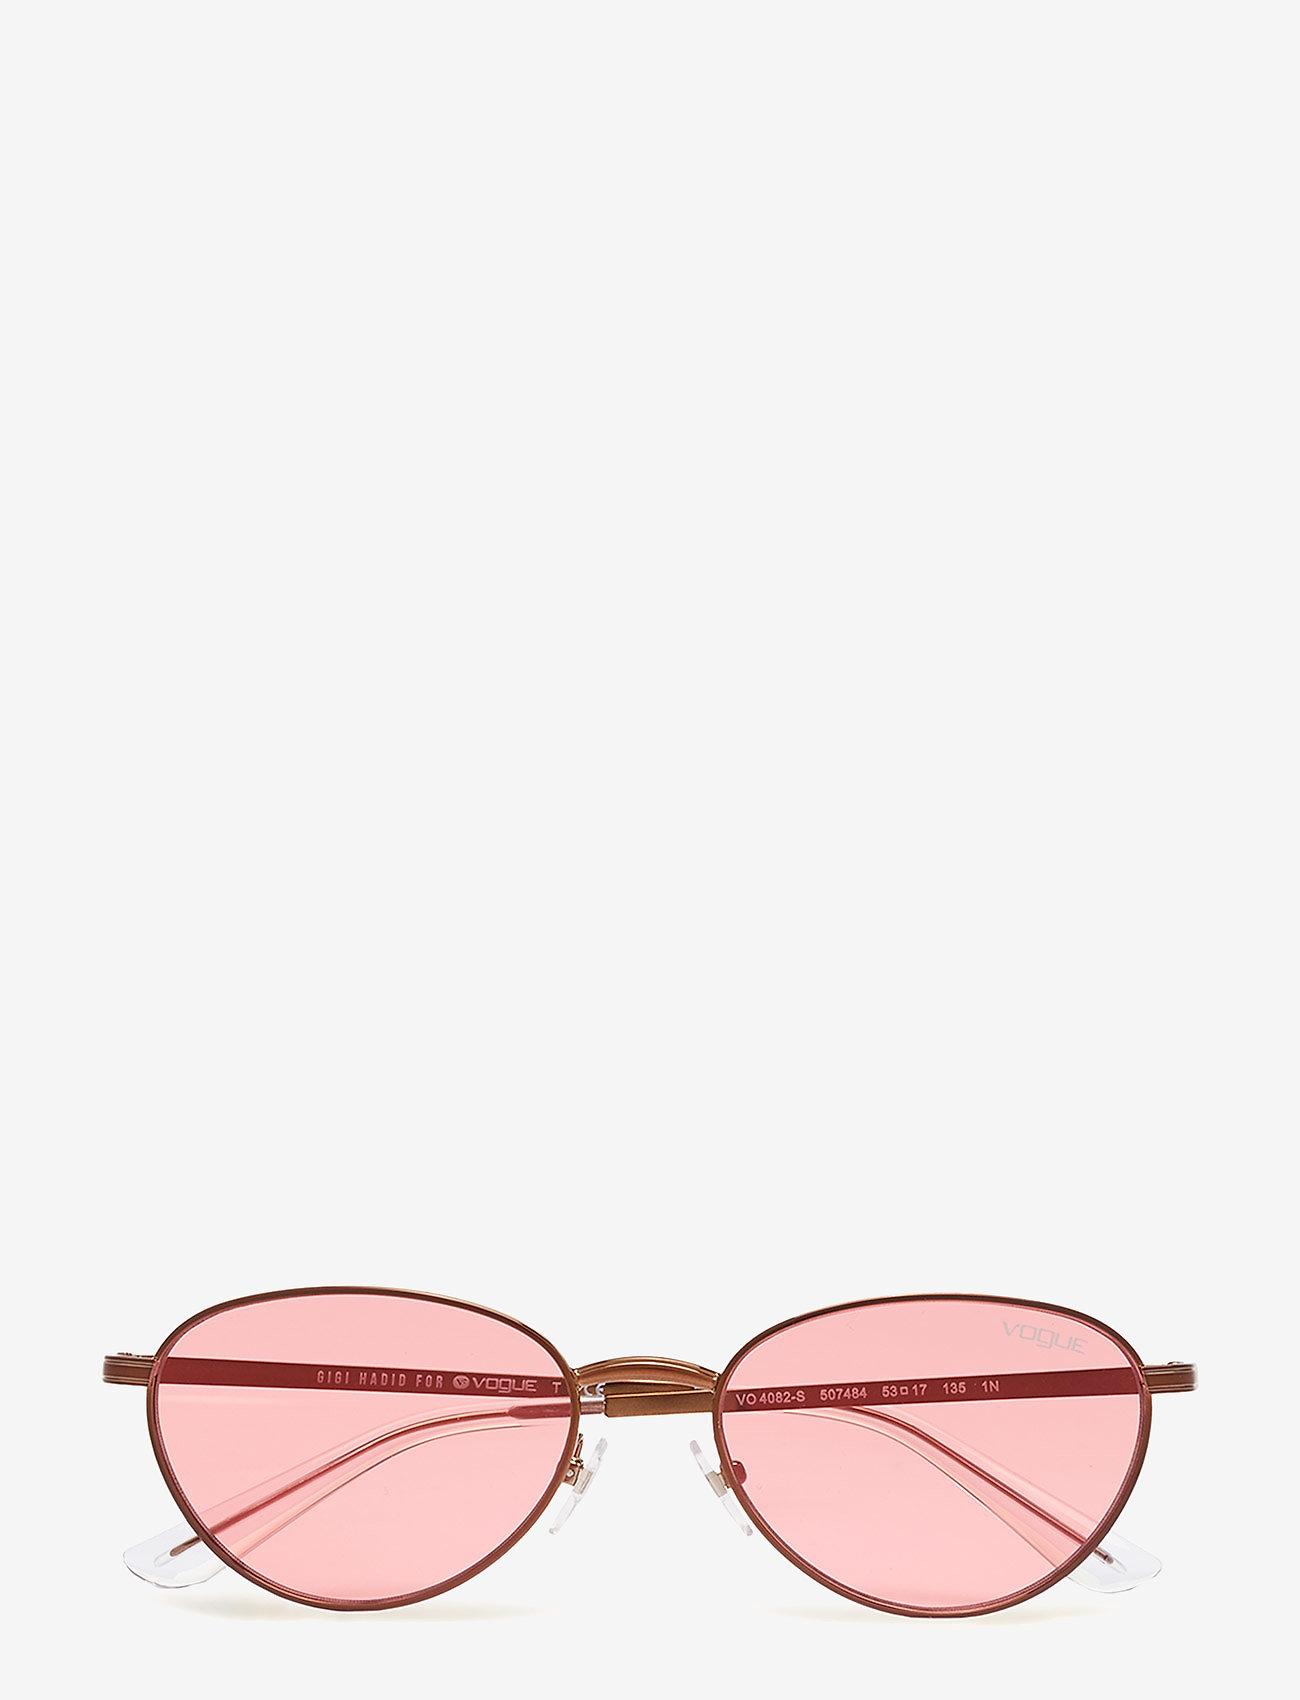 Vogue Eyewear - WOMEN'S SUNGLASSES - rond model - copper light brown/pink - 0